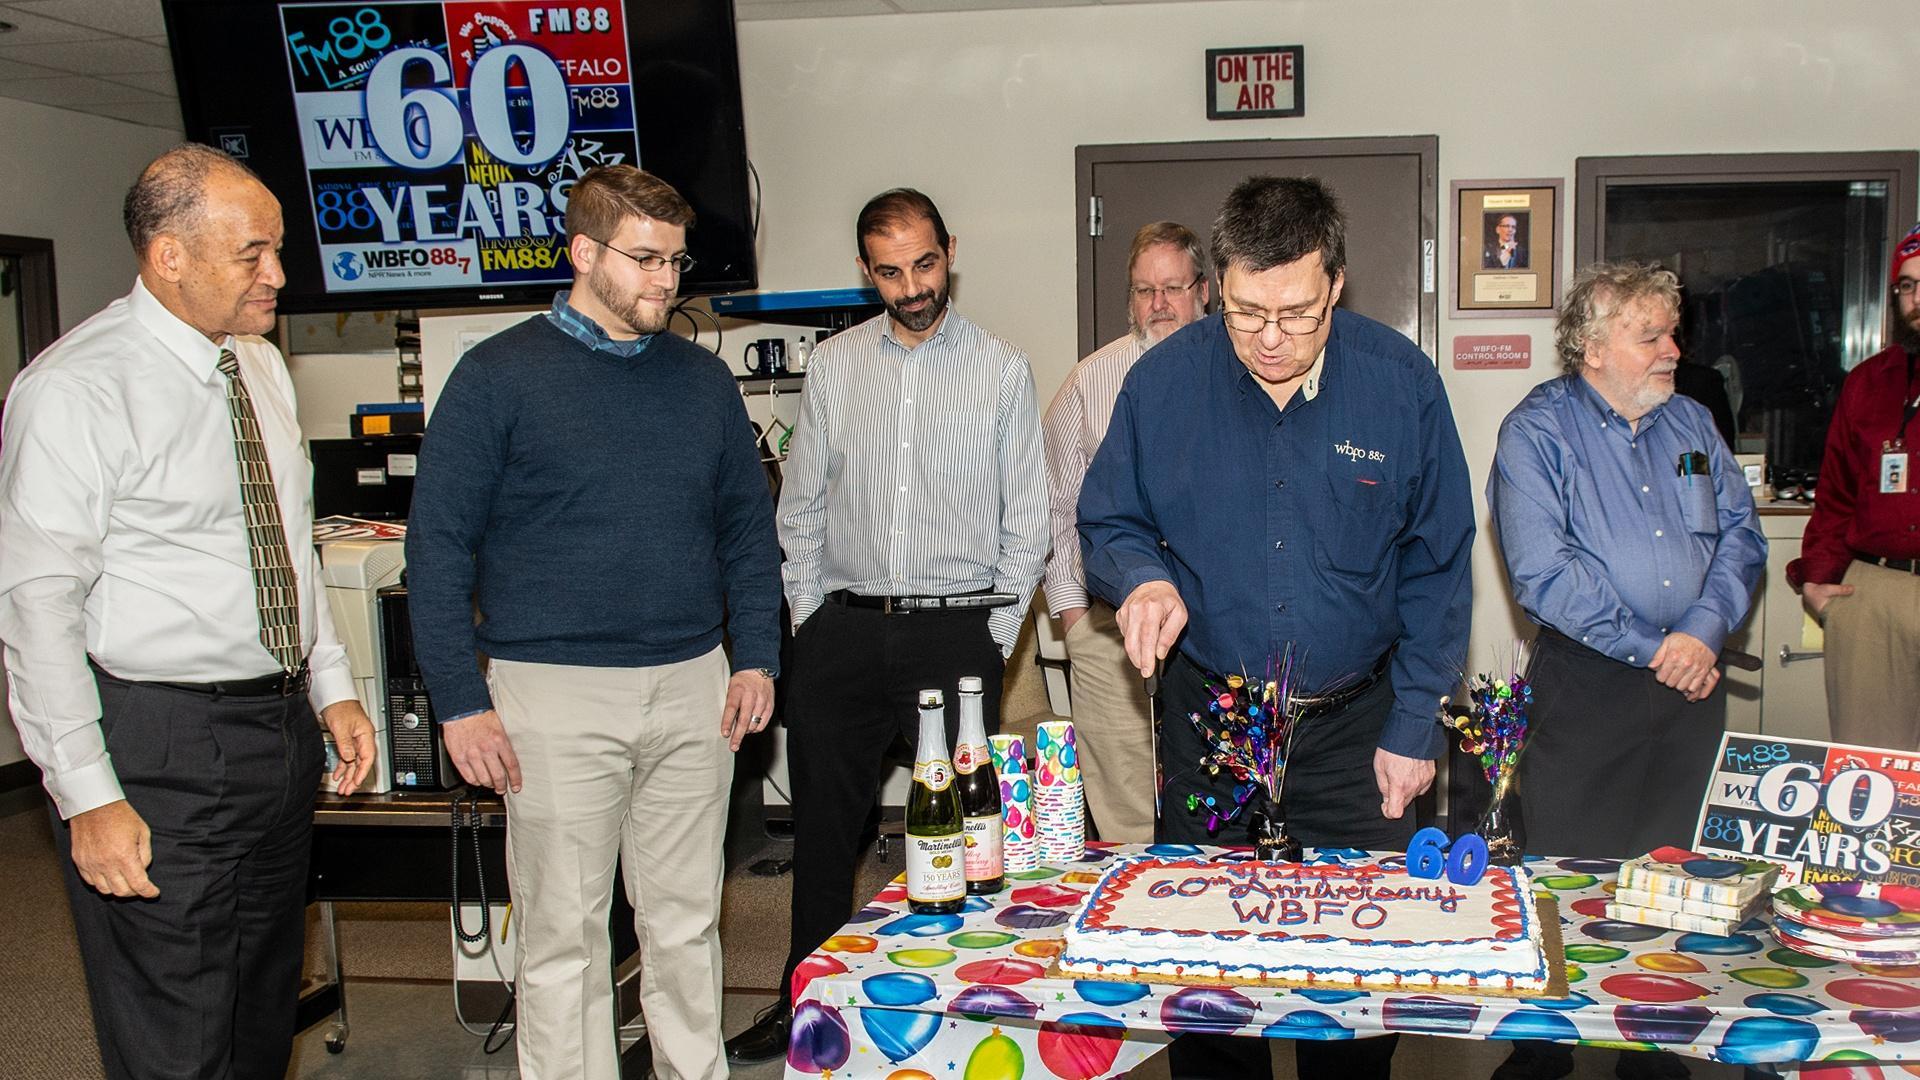 Mark Wozniak the longest current WBFO employee cut the cake to begin the celebration